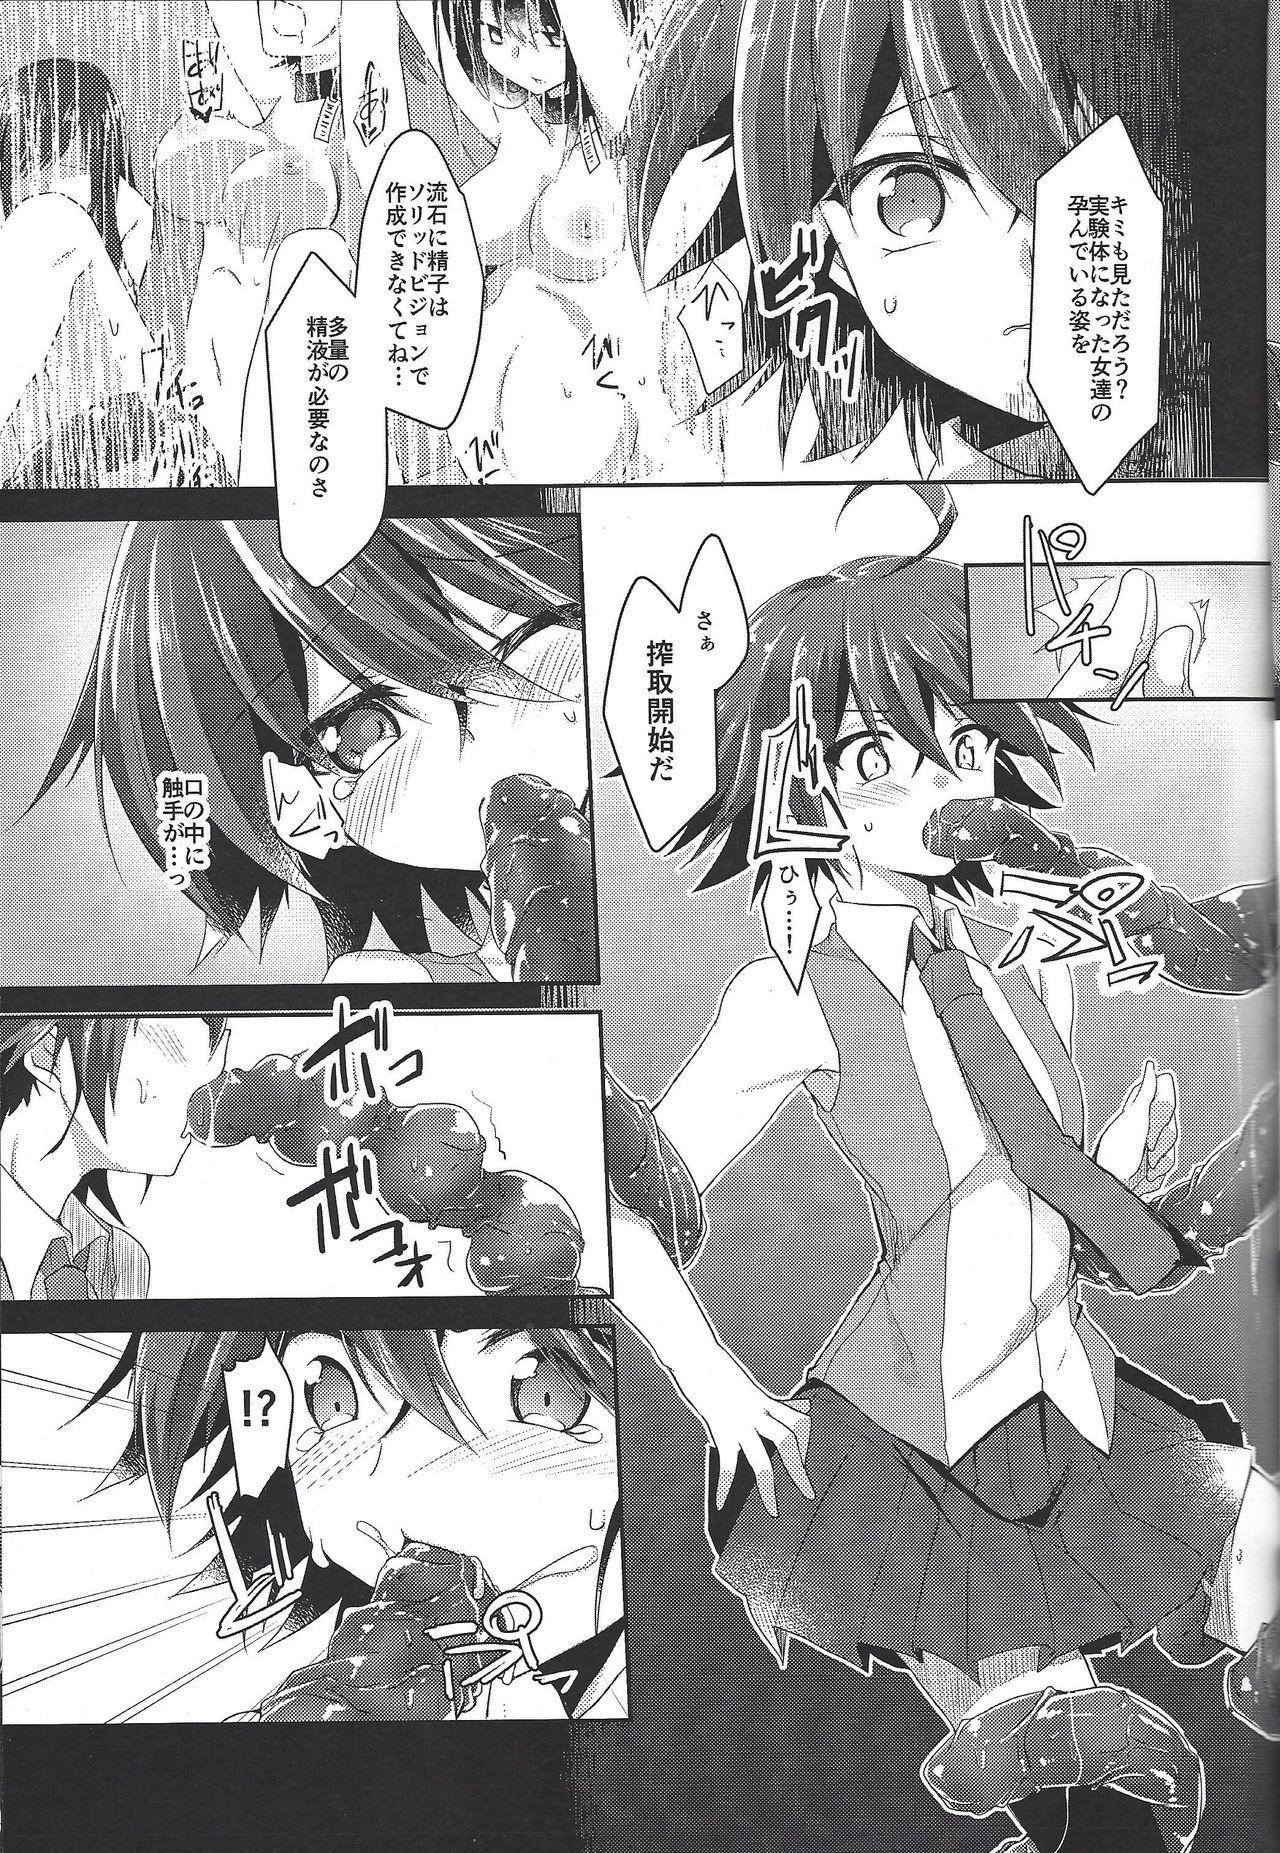 Kyousei Seieki Sakushu 5